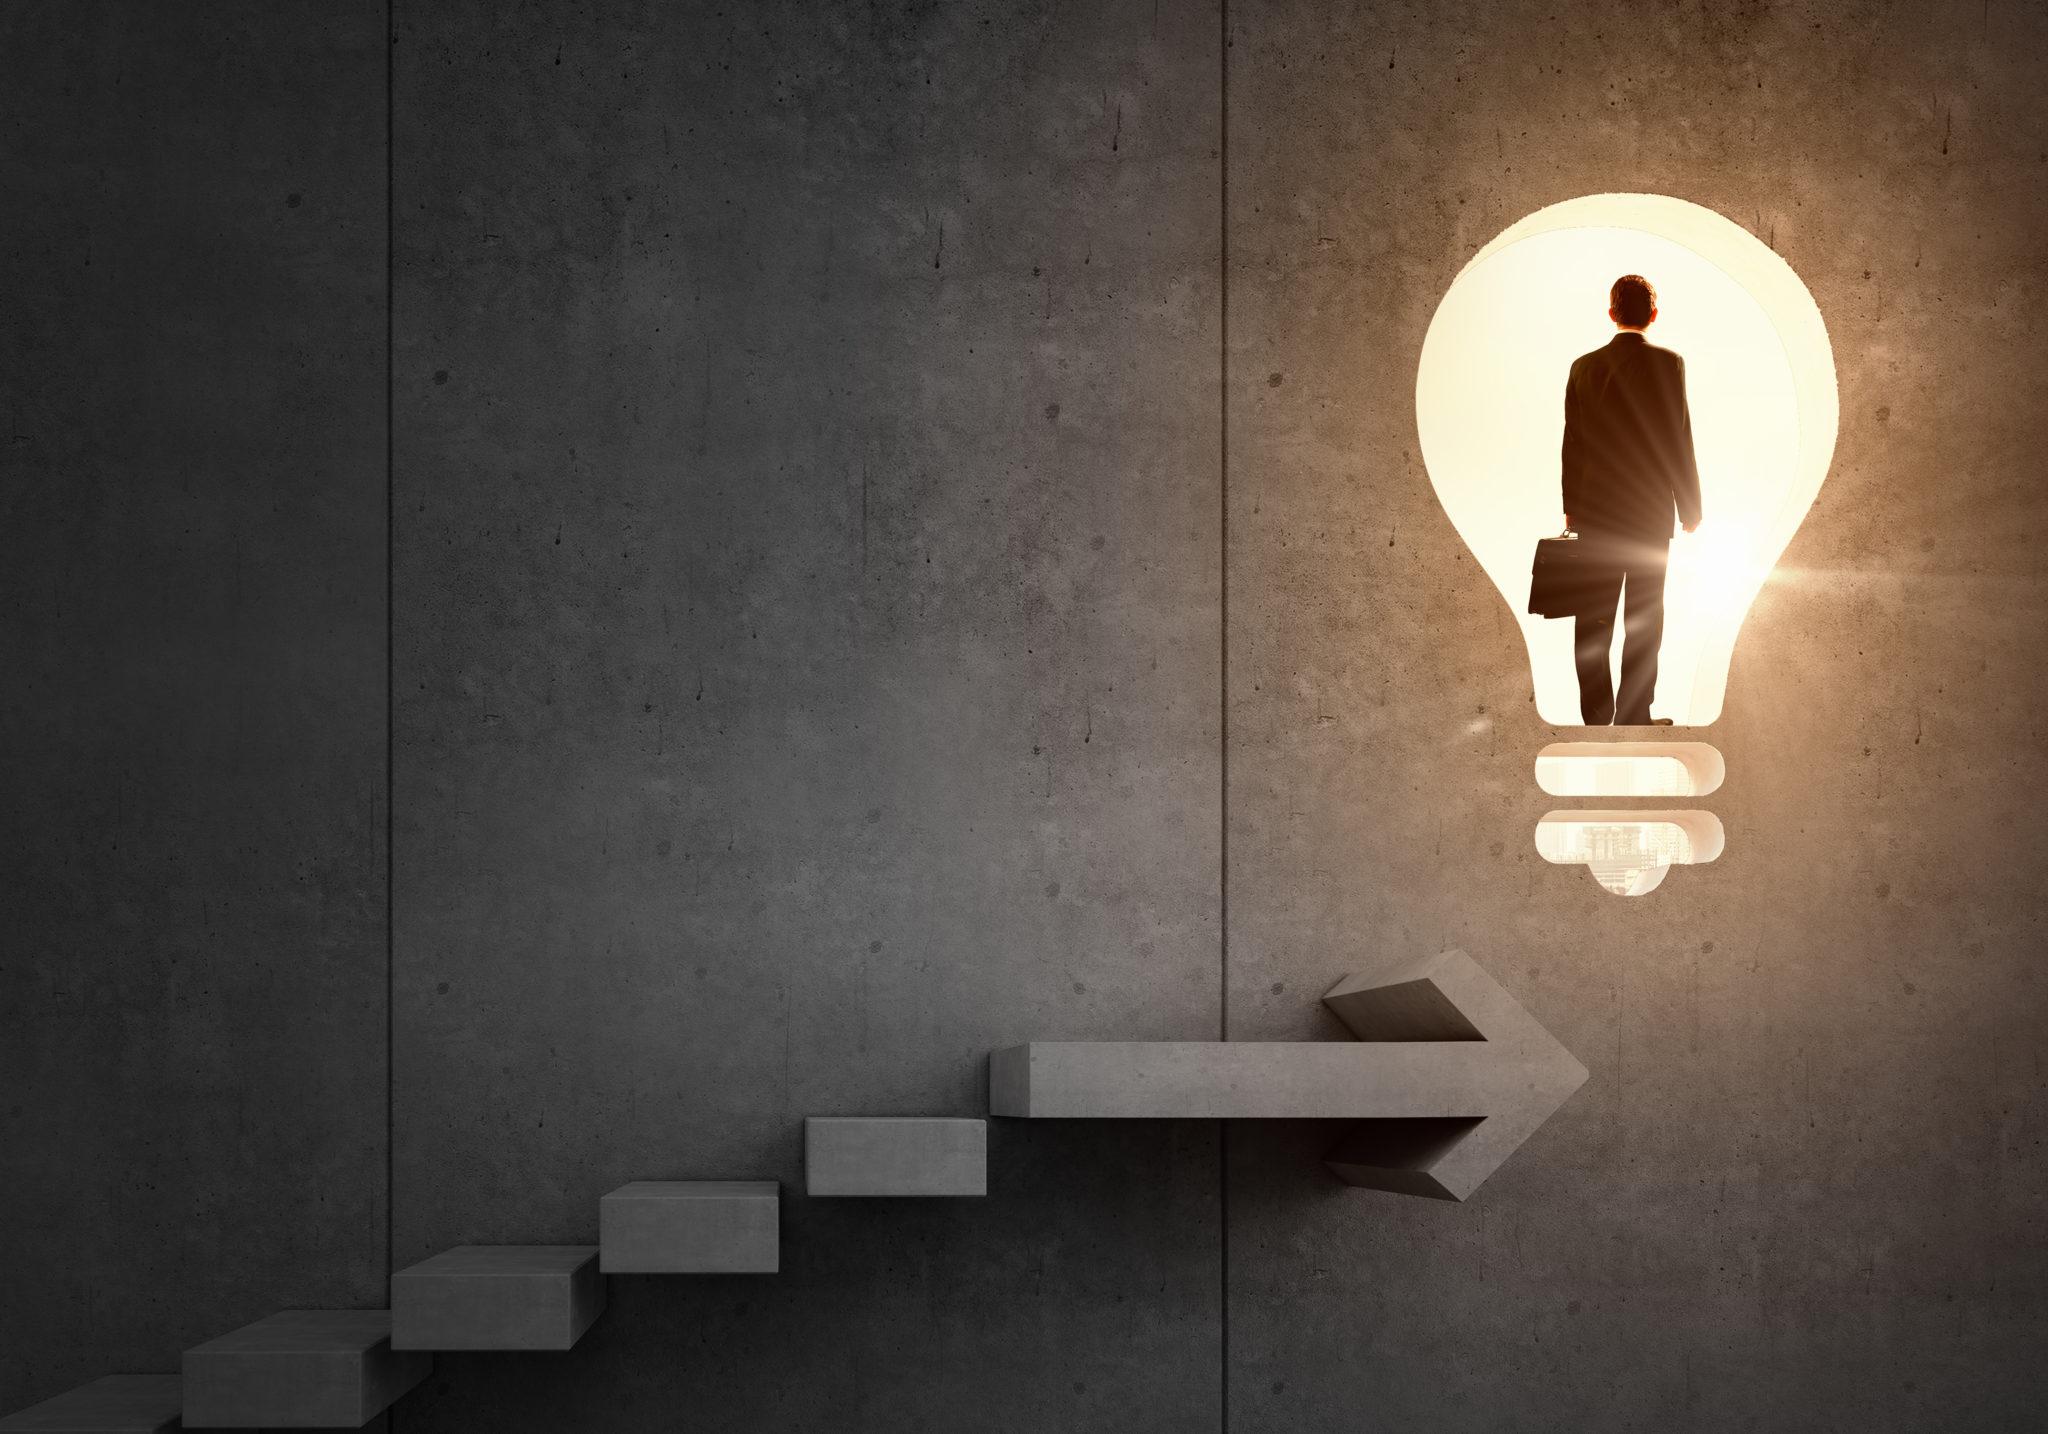 Entrepreneurship - How to get started right